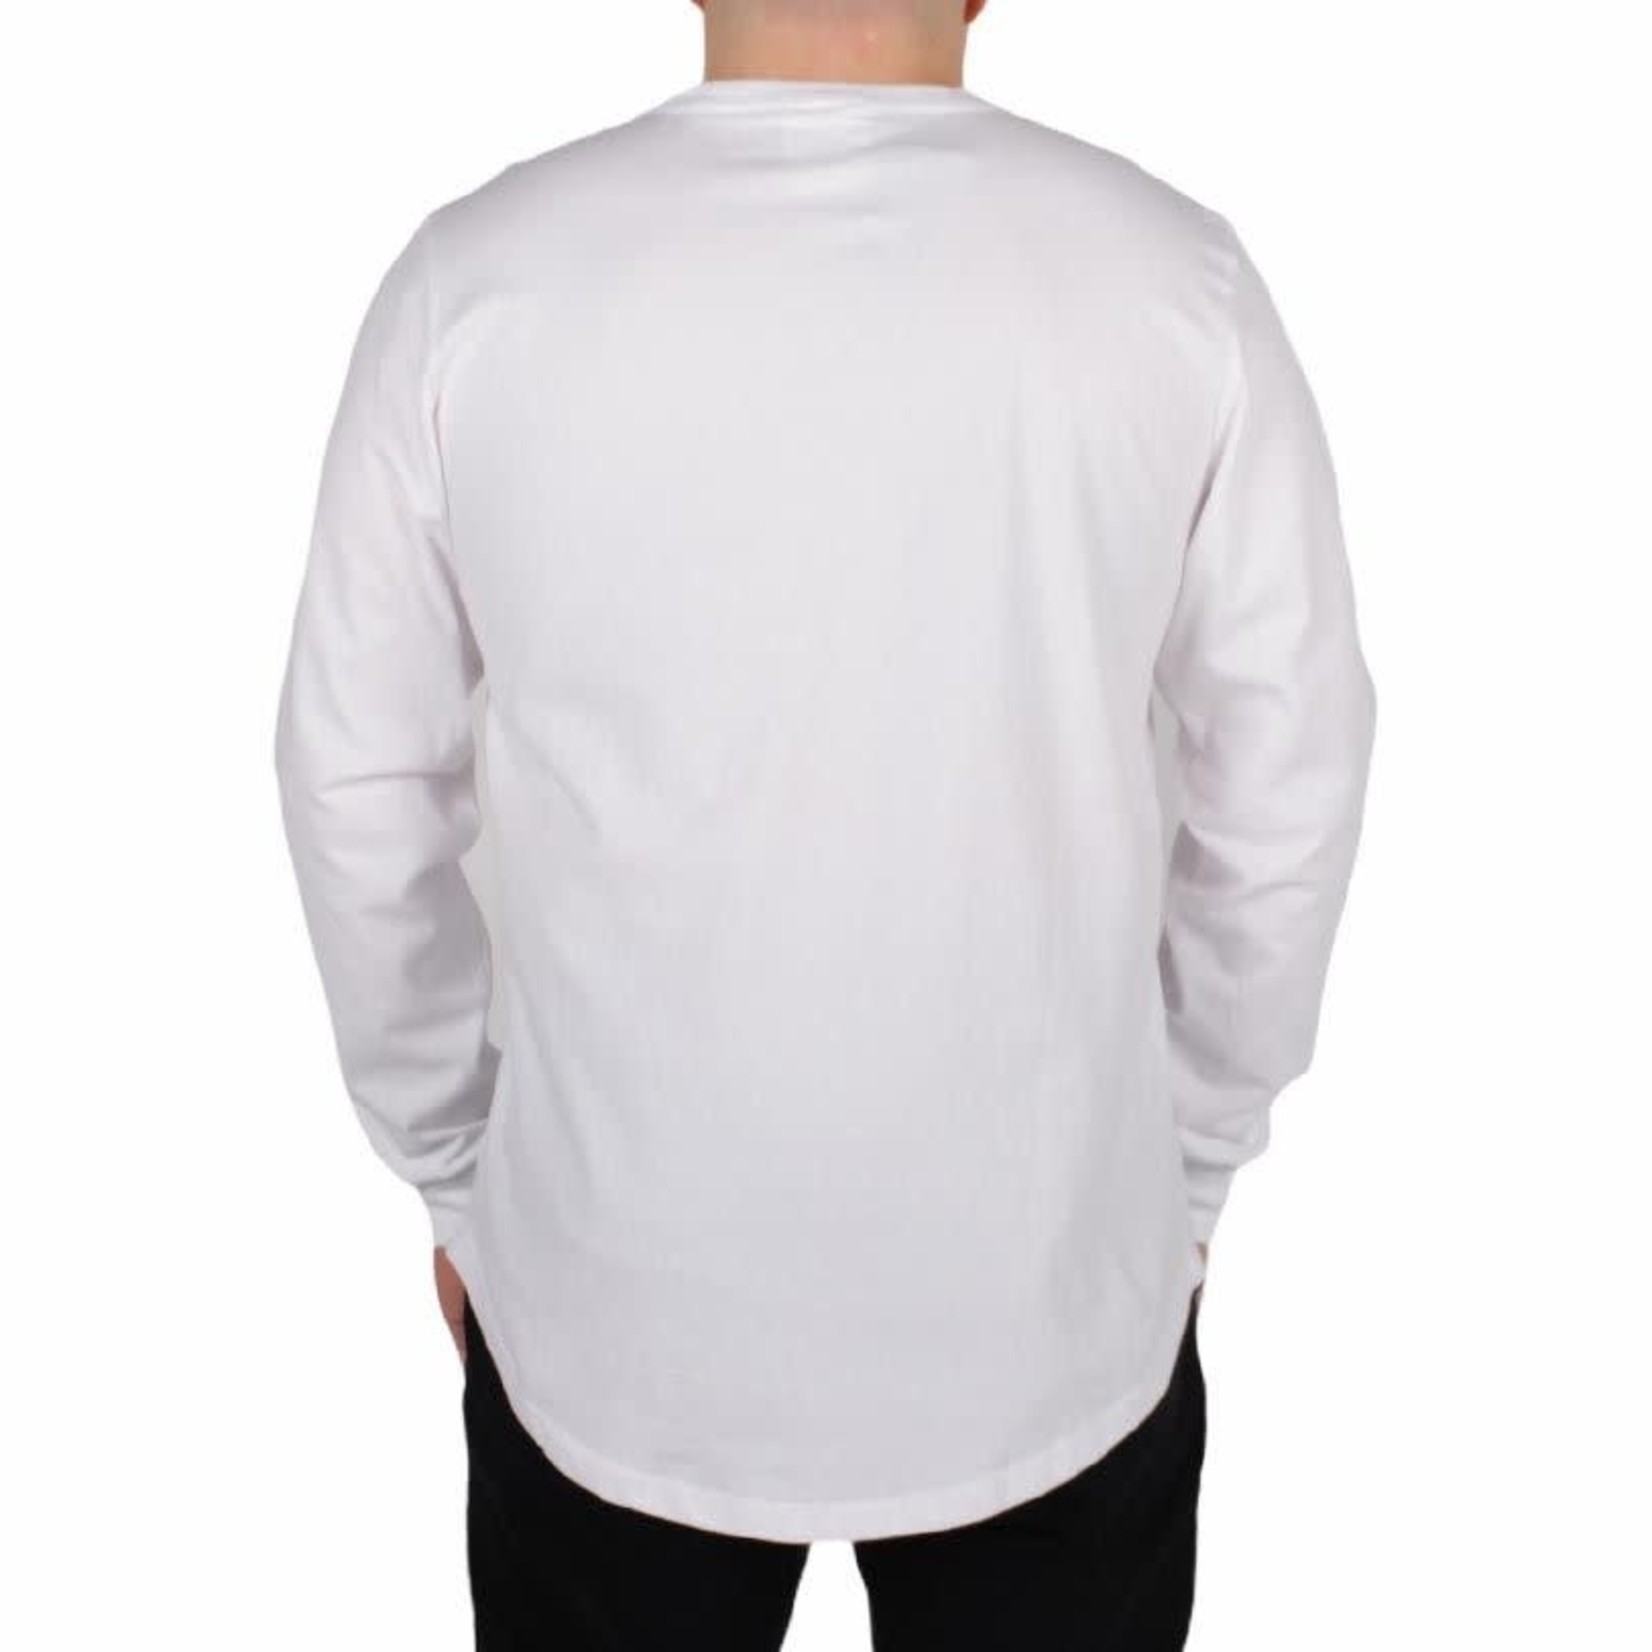 WLKN WLKN : Heart Script L/S T-Shirt